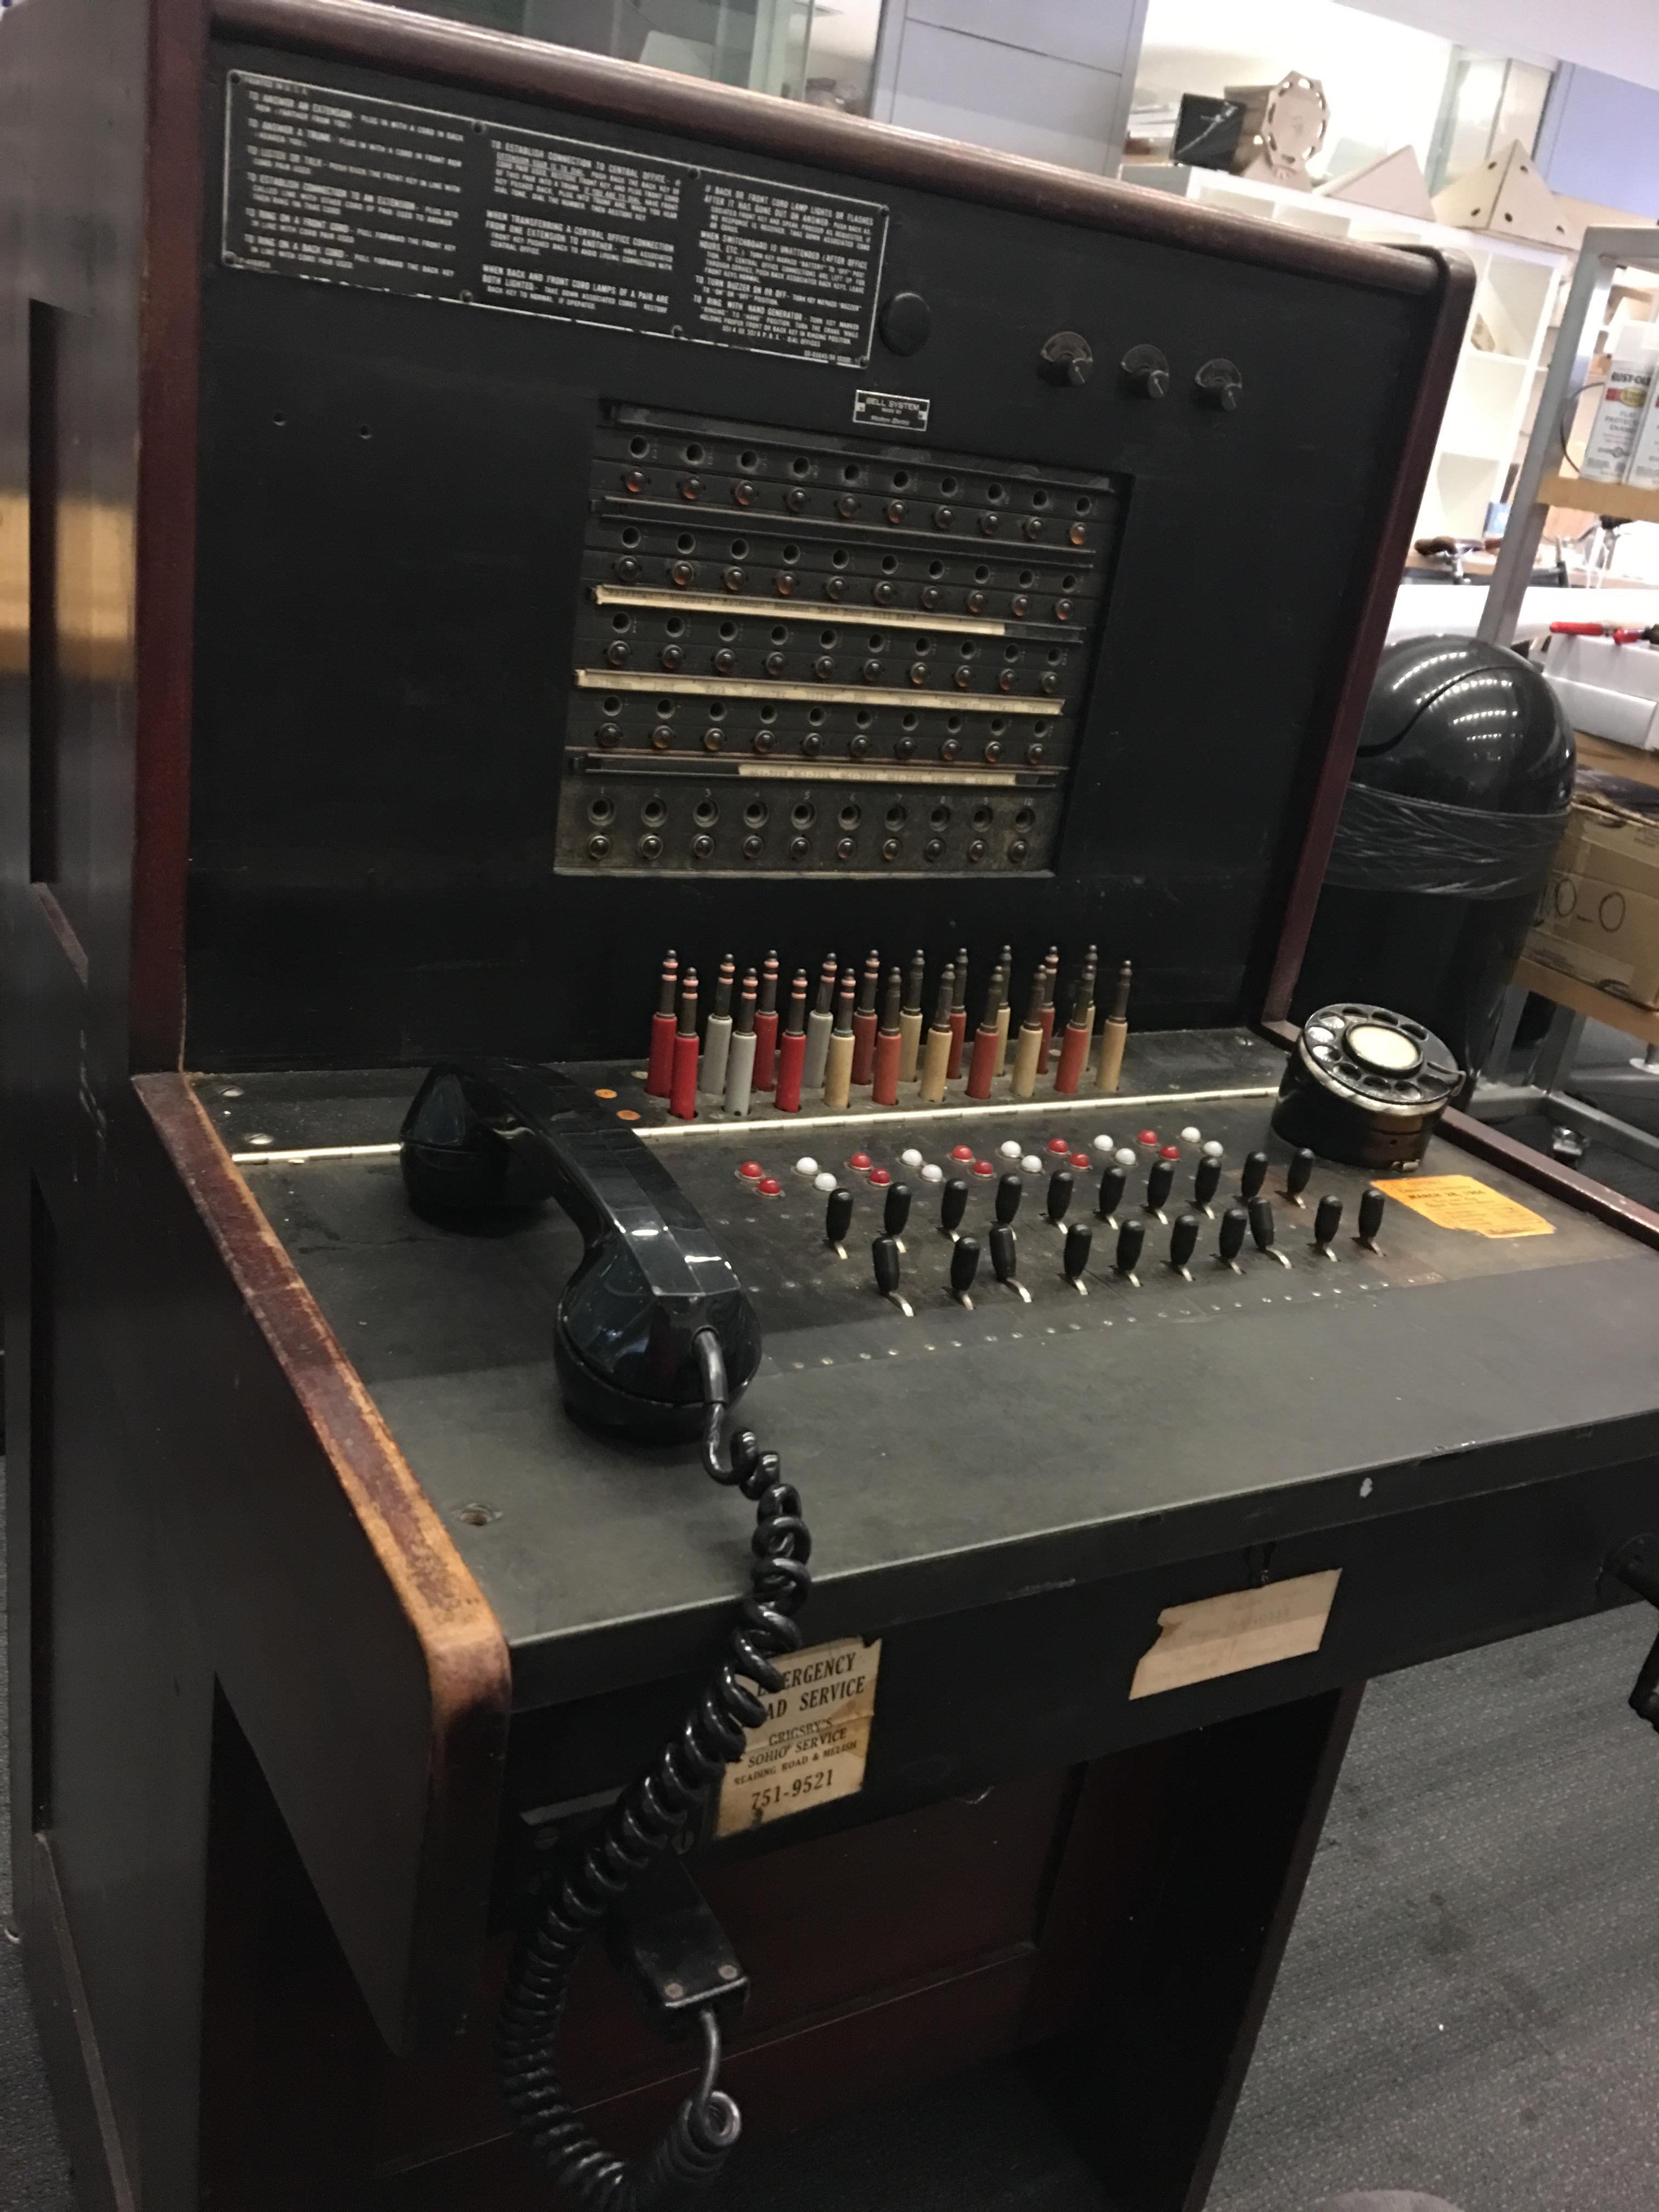 Refurbishing A 1927 Switchboard, Part 1: Wiring